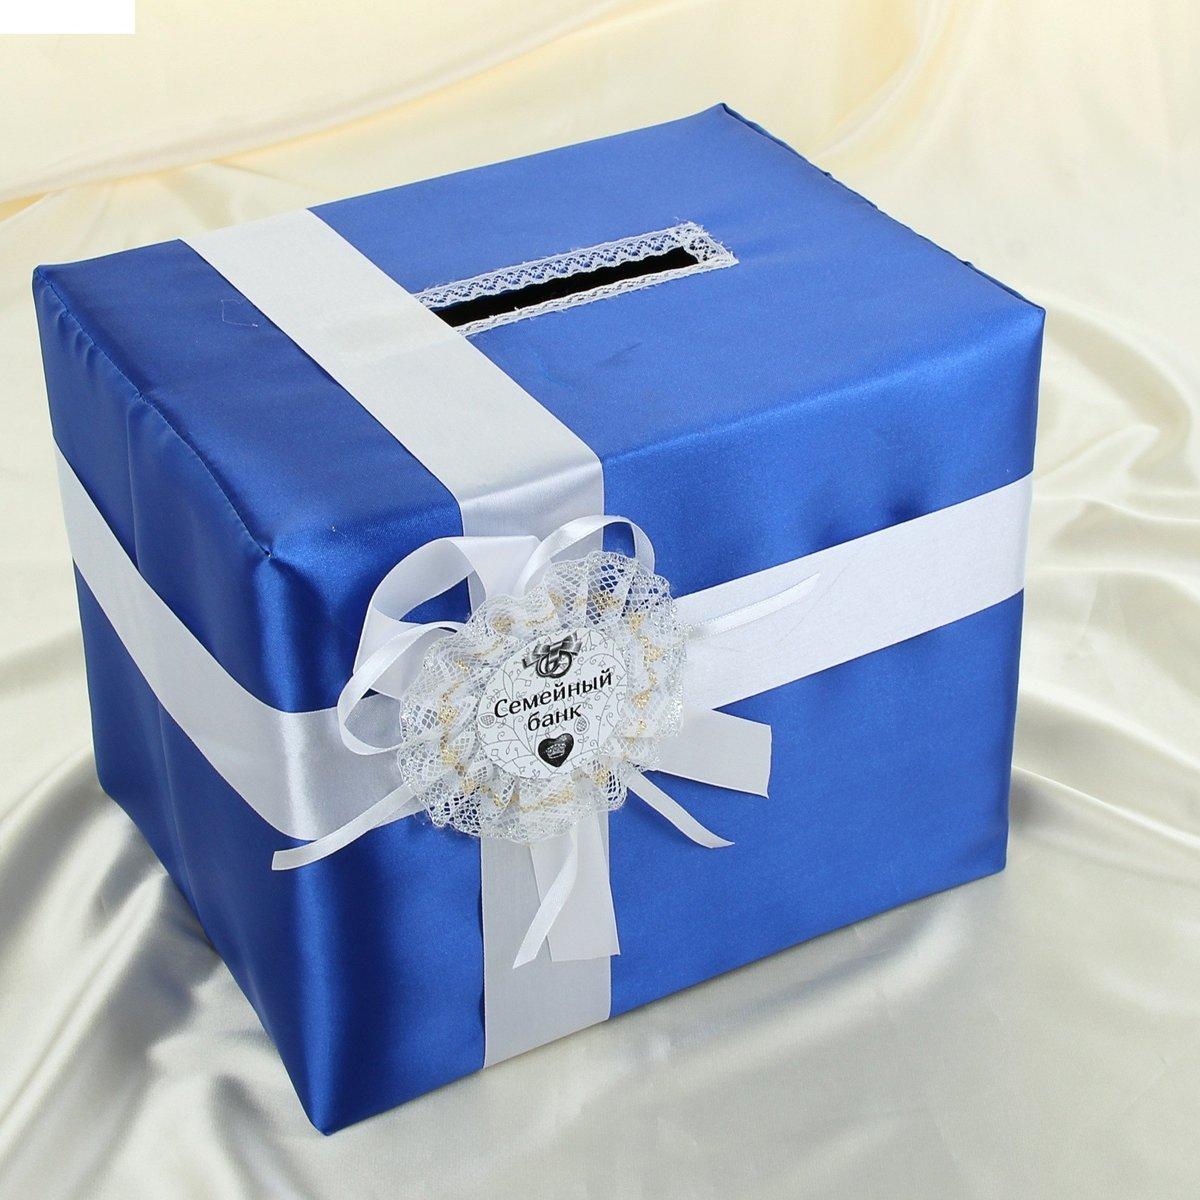 Своими руками коробку для денег на свадьбу 33